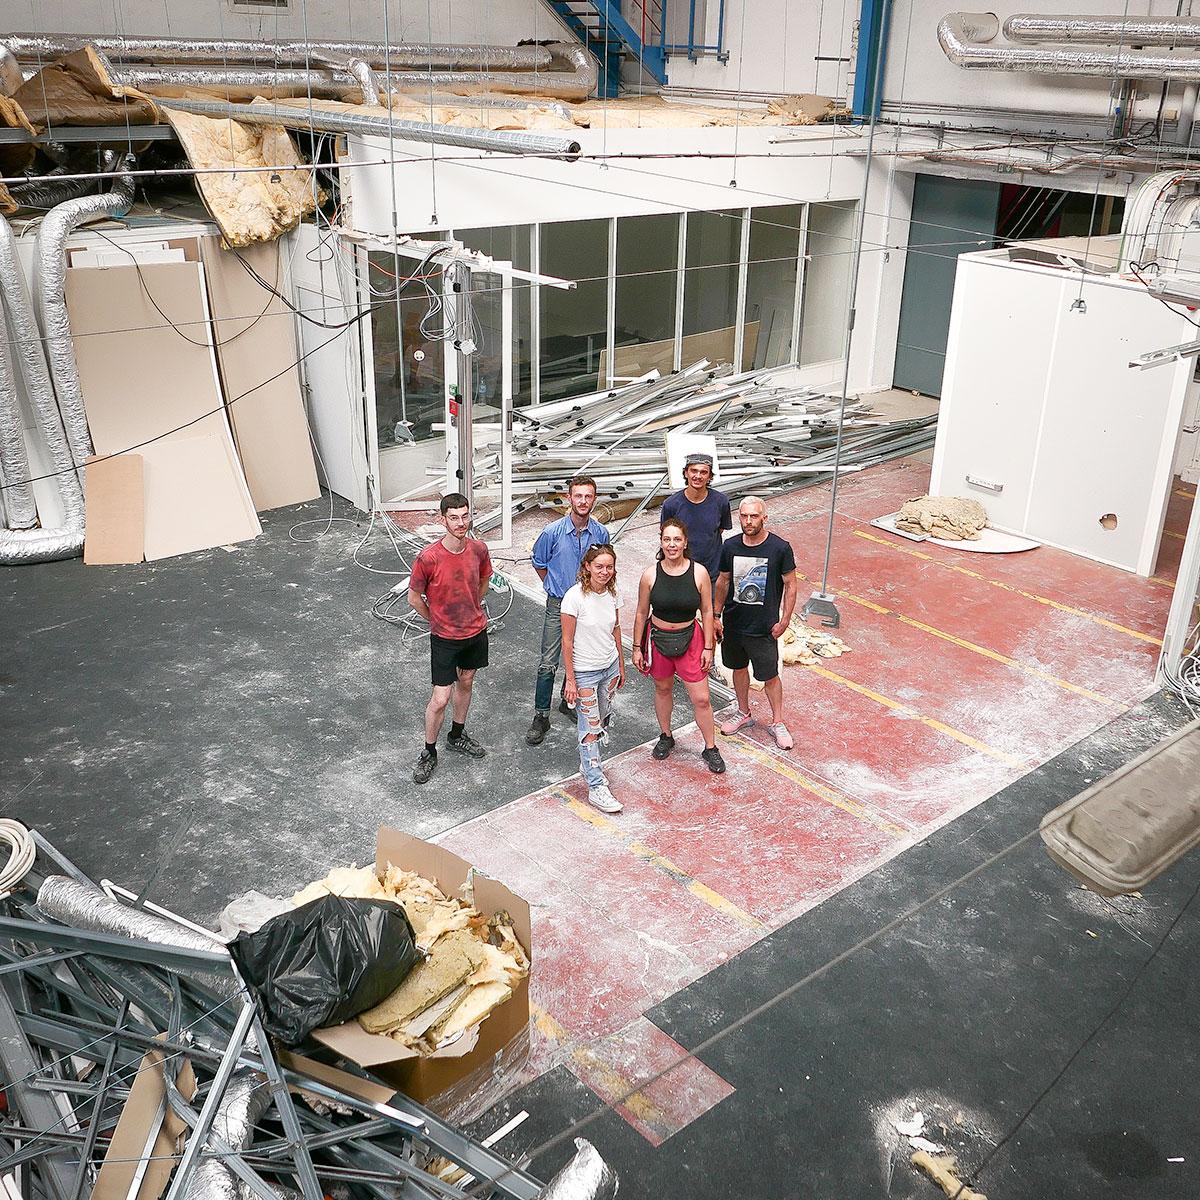 Quentin Dupuy, Clément Pelisson, Gabriel Bercolano, Smith.367, Olga Shalashova, Lor-k ______   © photo : Stéphane Carricondo